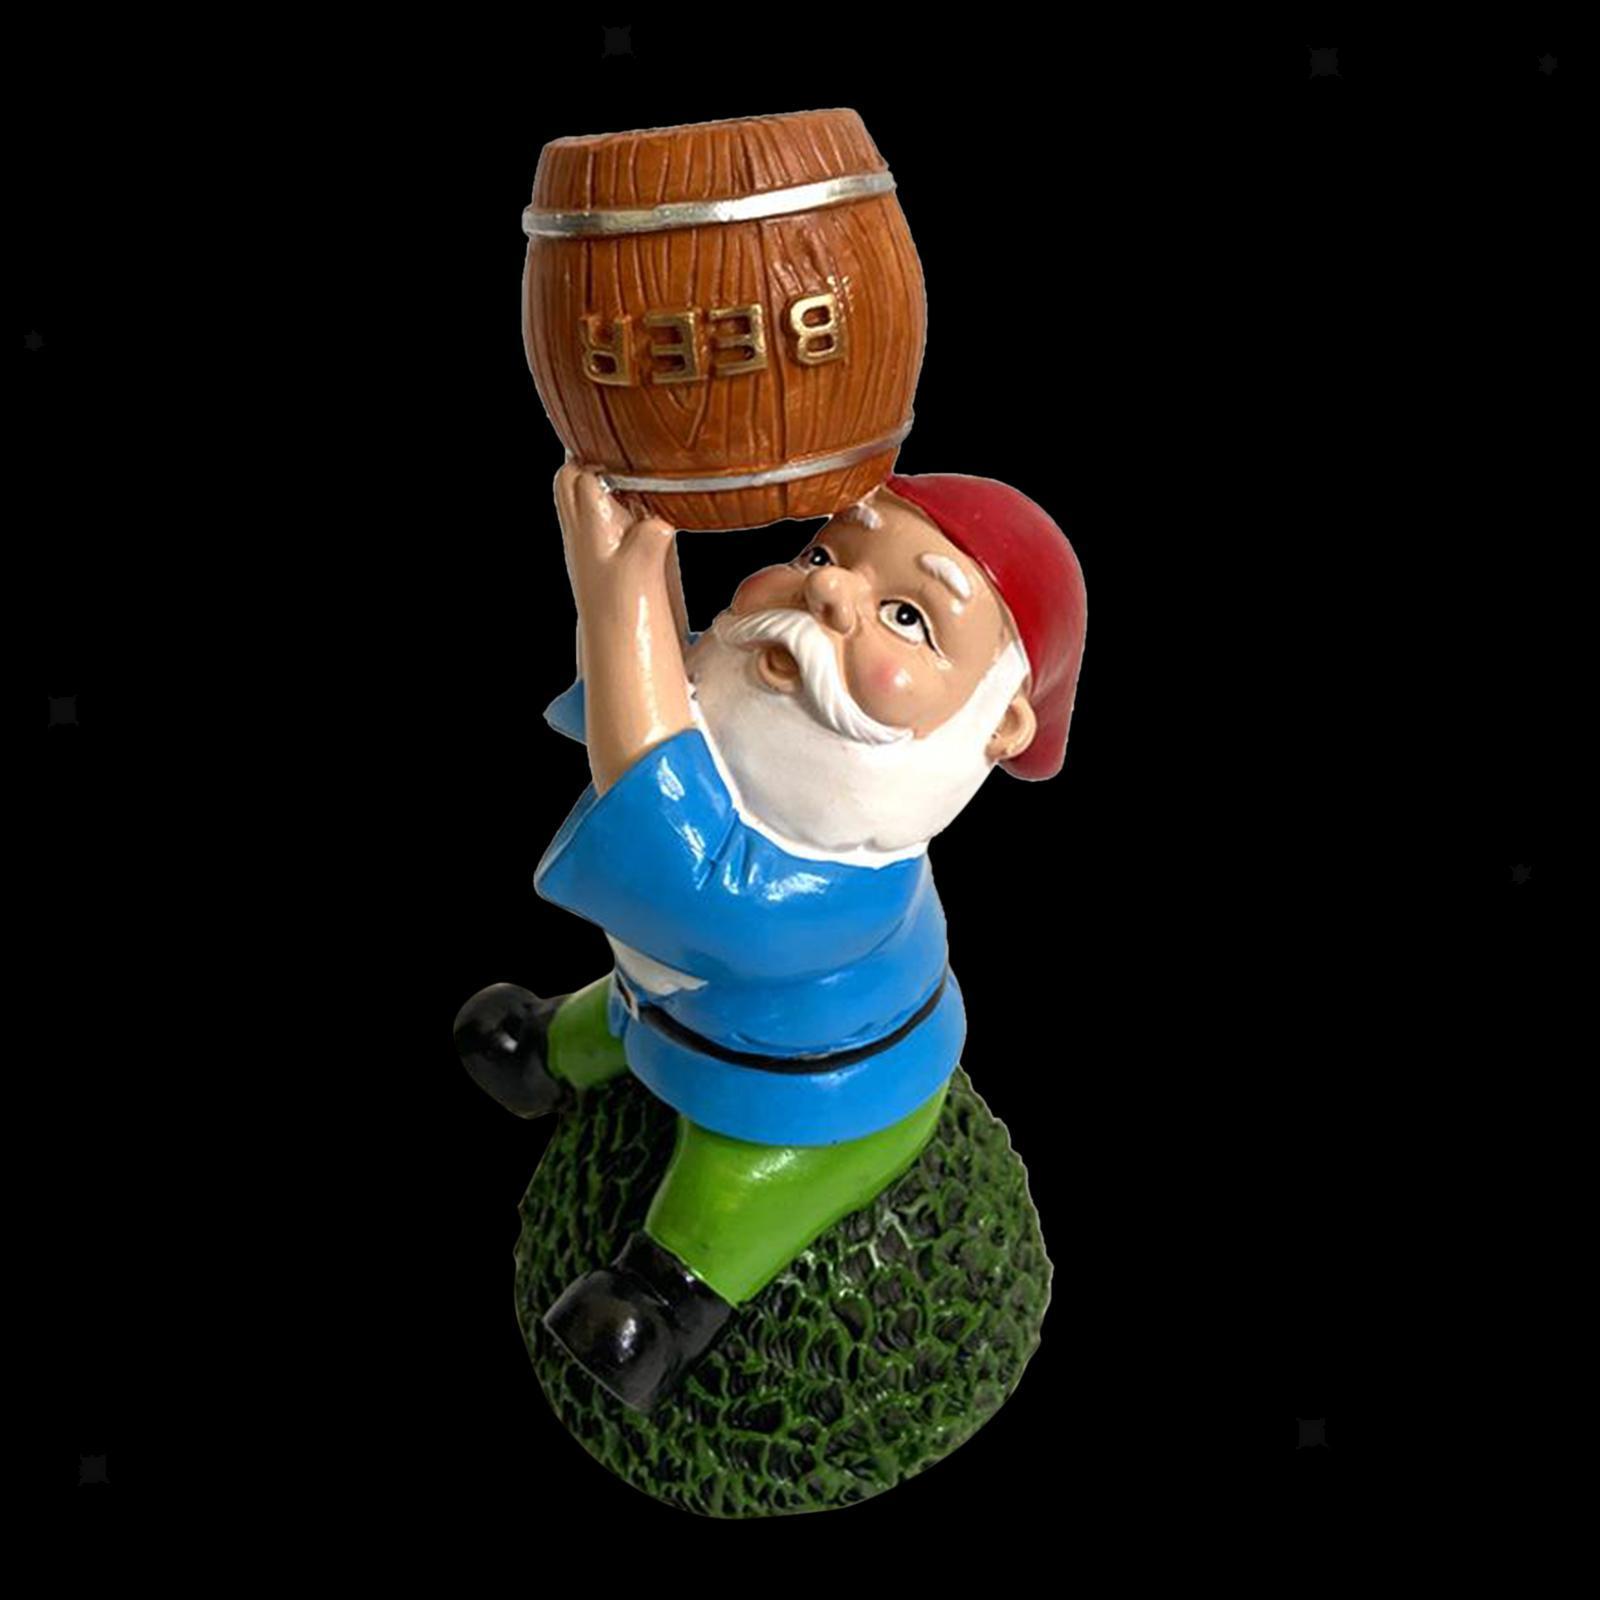 thumbnail 21 - Funny Resin Naughty Garden Gnome Statue Ornaments Outdoor Villa Home Figurines